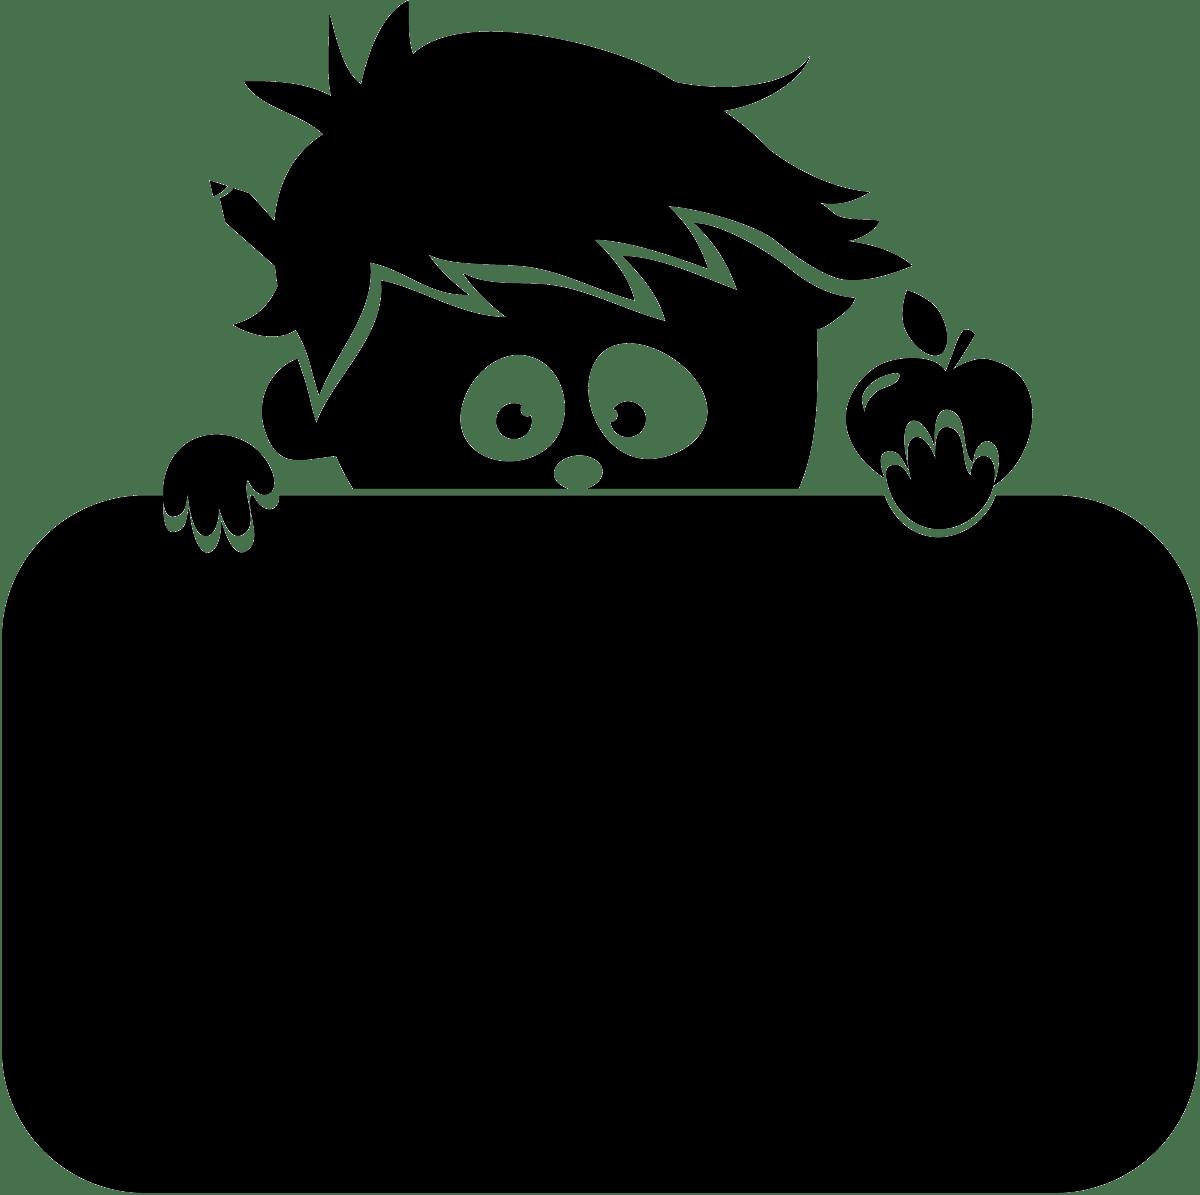 Kinderzimmer Wandtattoo: Blackboard